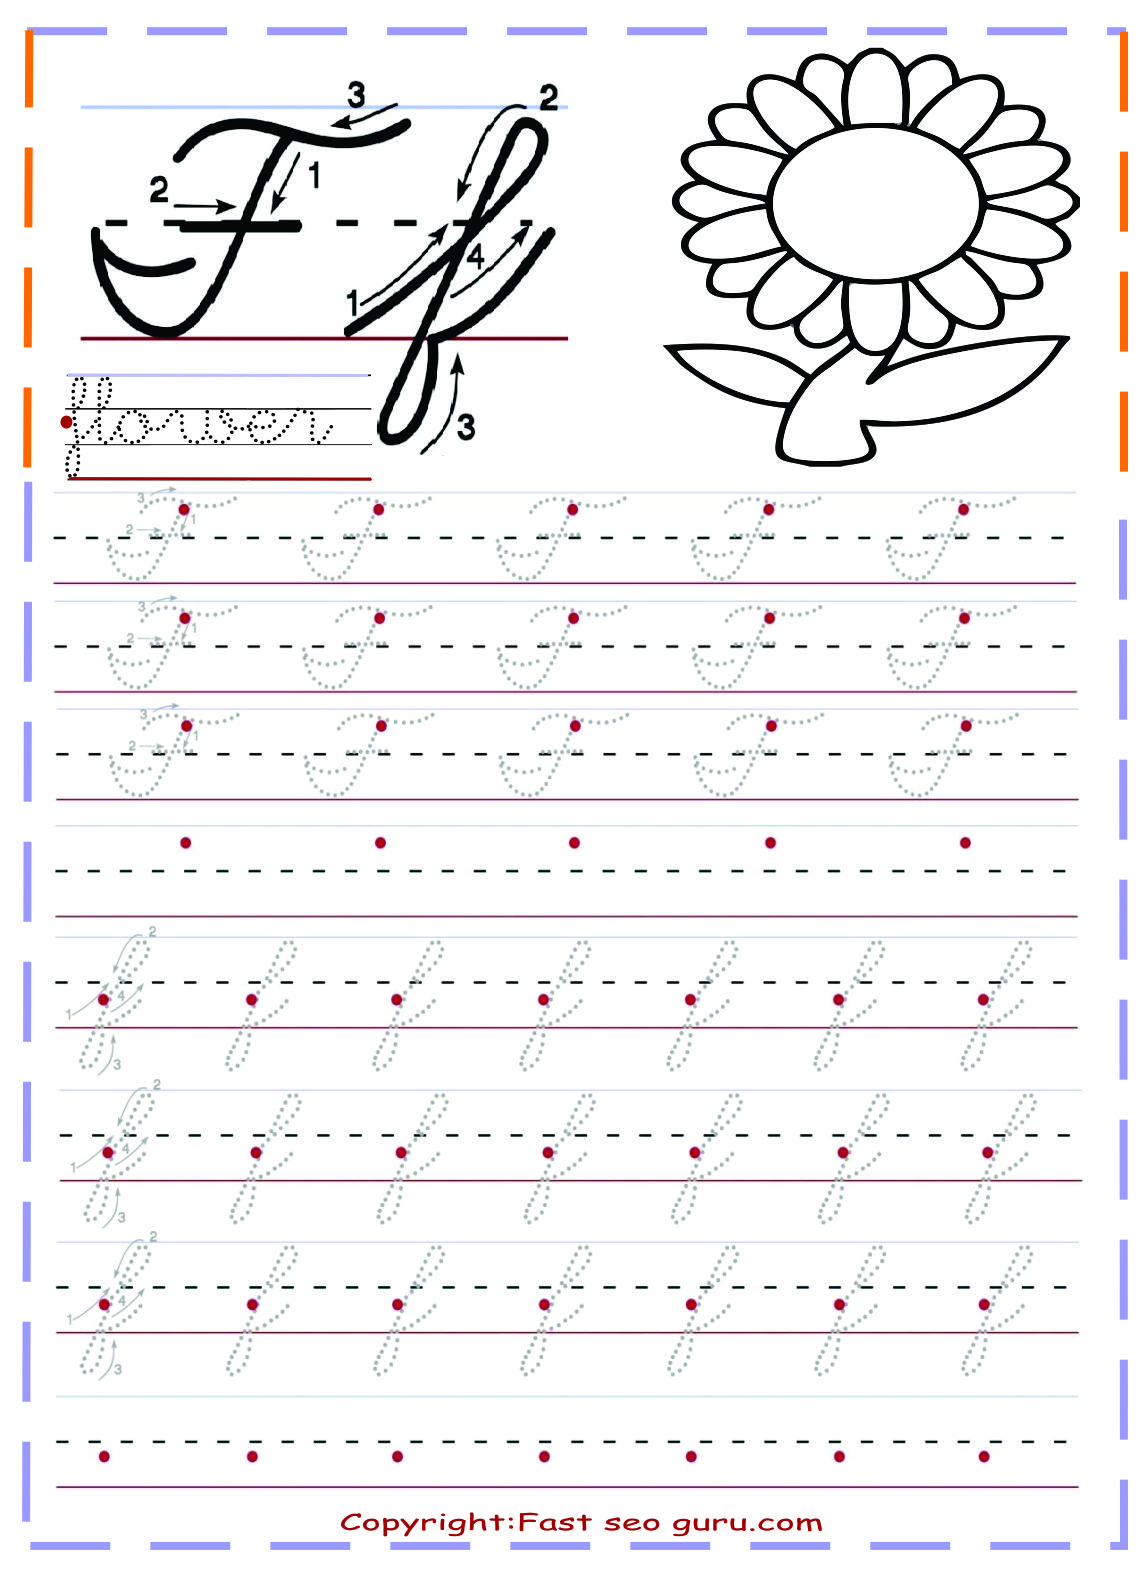 Cursive Handwriting Tracing Worksheets For Practice Letter F for Handwriting Tracing Letters